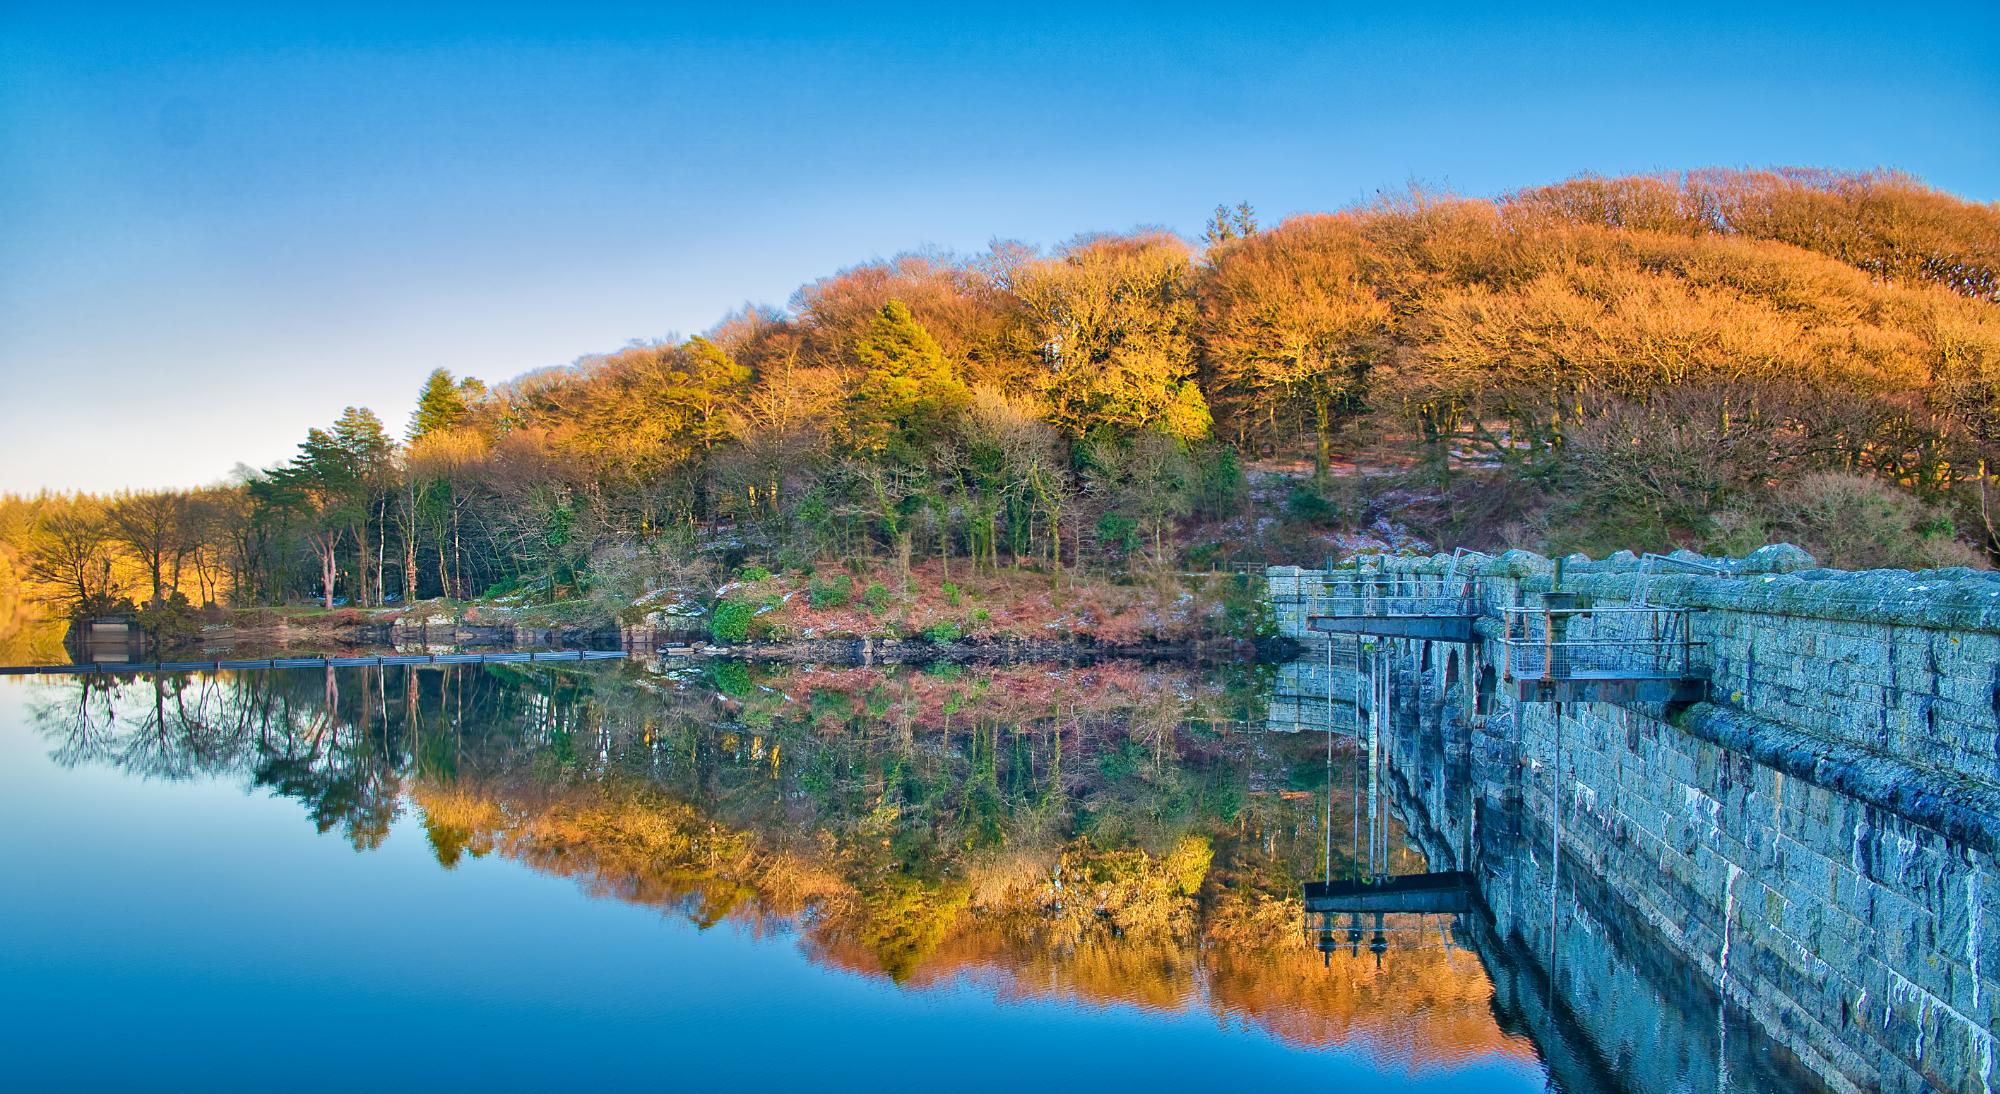 Burrator reservoir dam, United Kingdom